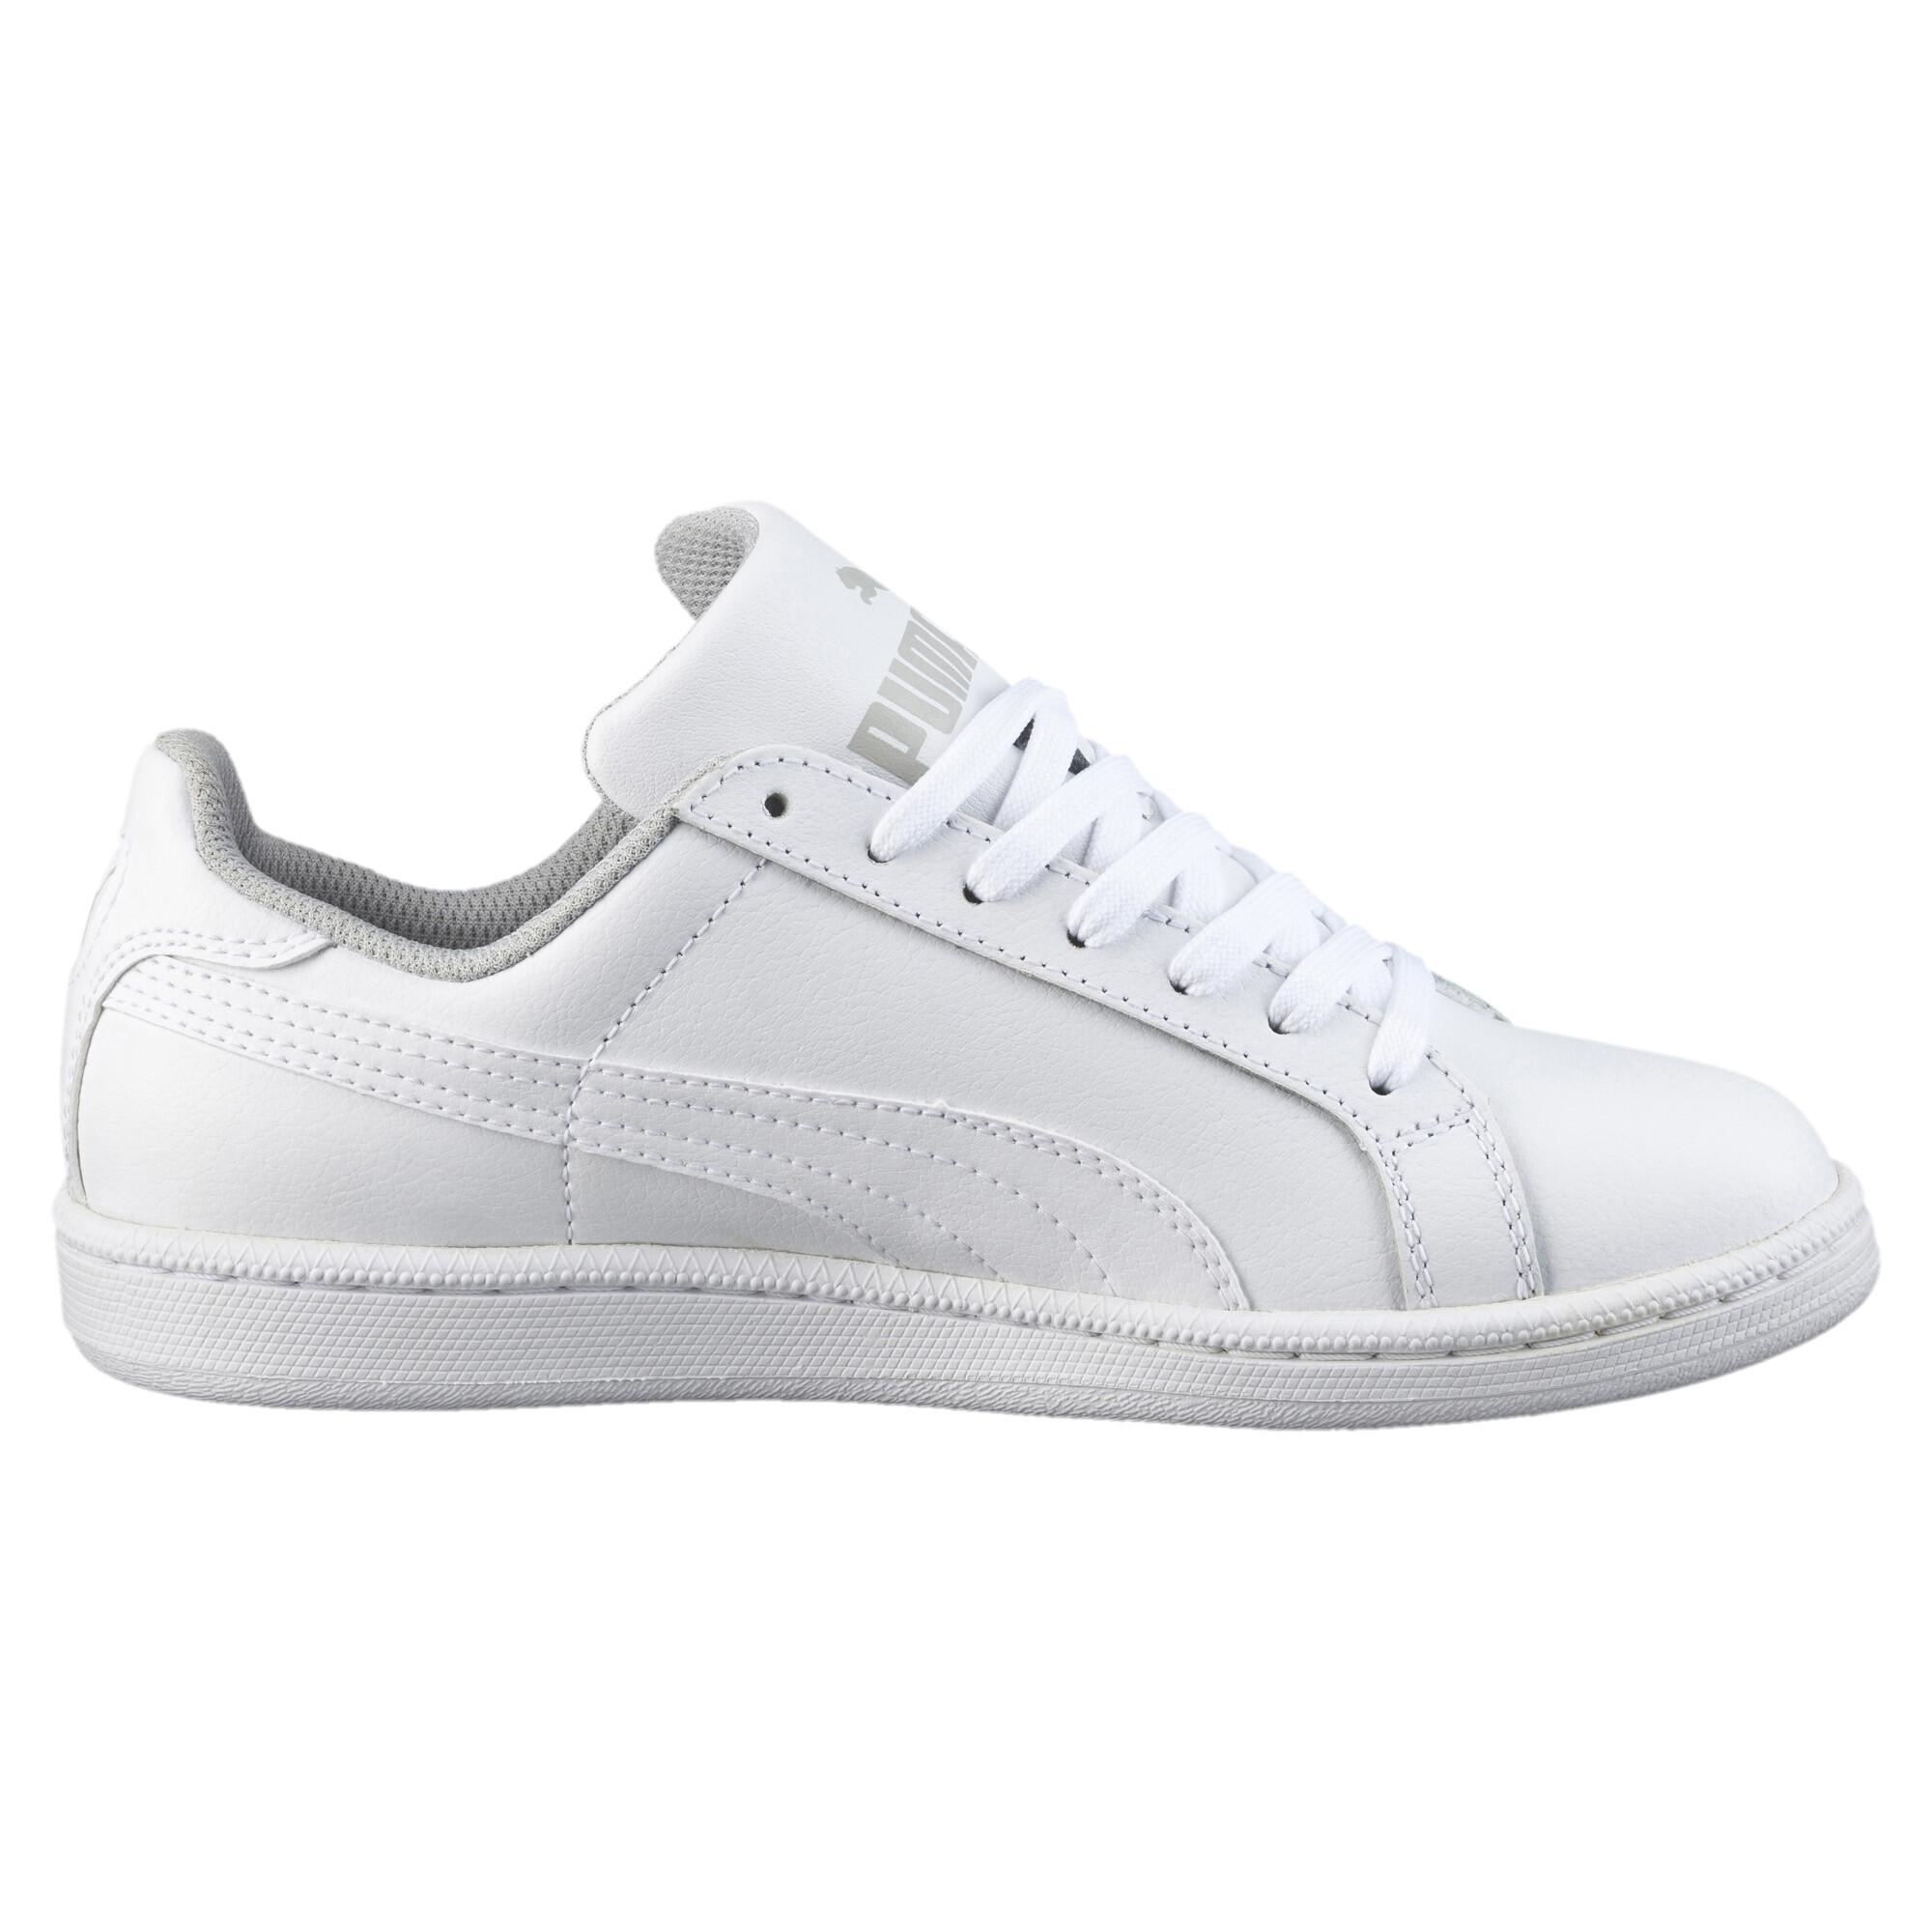 PUMA-Smash-Jr-Sneaker-Unisex-Schuhe-Kinder-Neu Indexbild 10